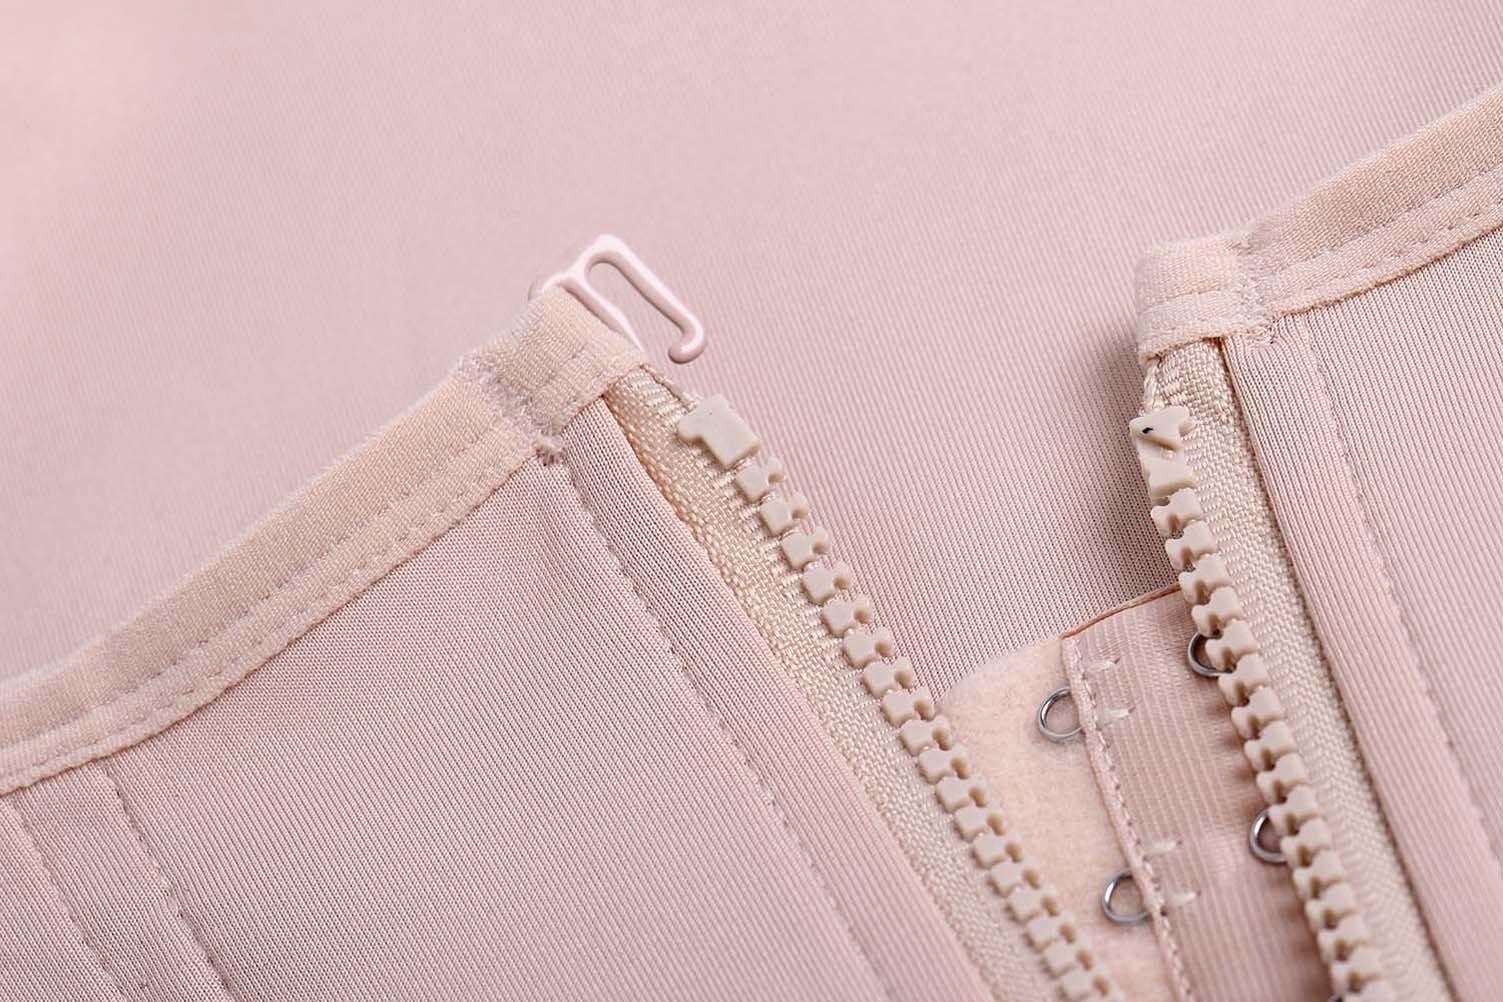 682ba67d579 Eleady Women s Underbust Corset Waist Trainer Cincher Steel Boned Body  Shaper Vest with Adjustable Straps (S